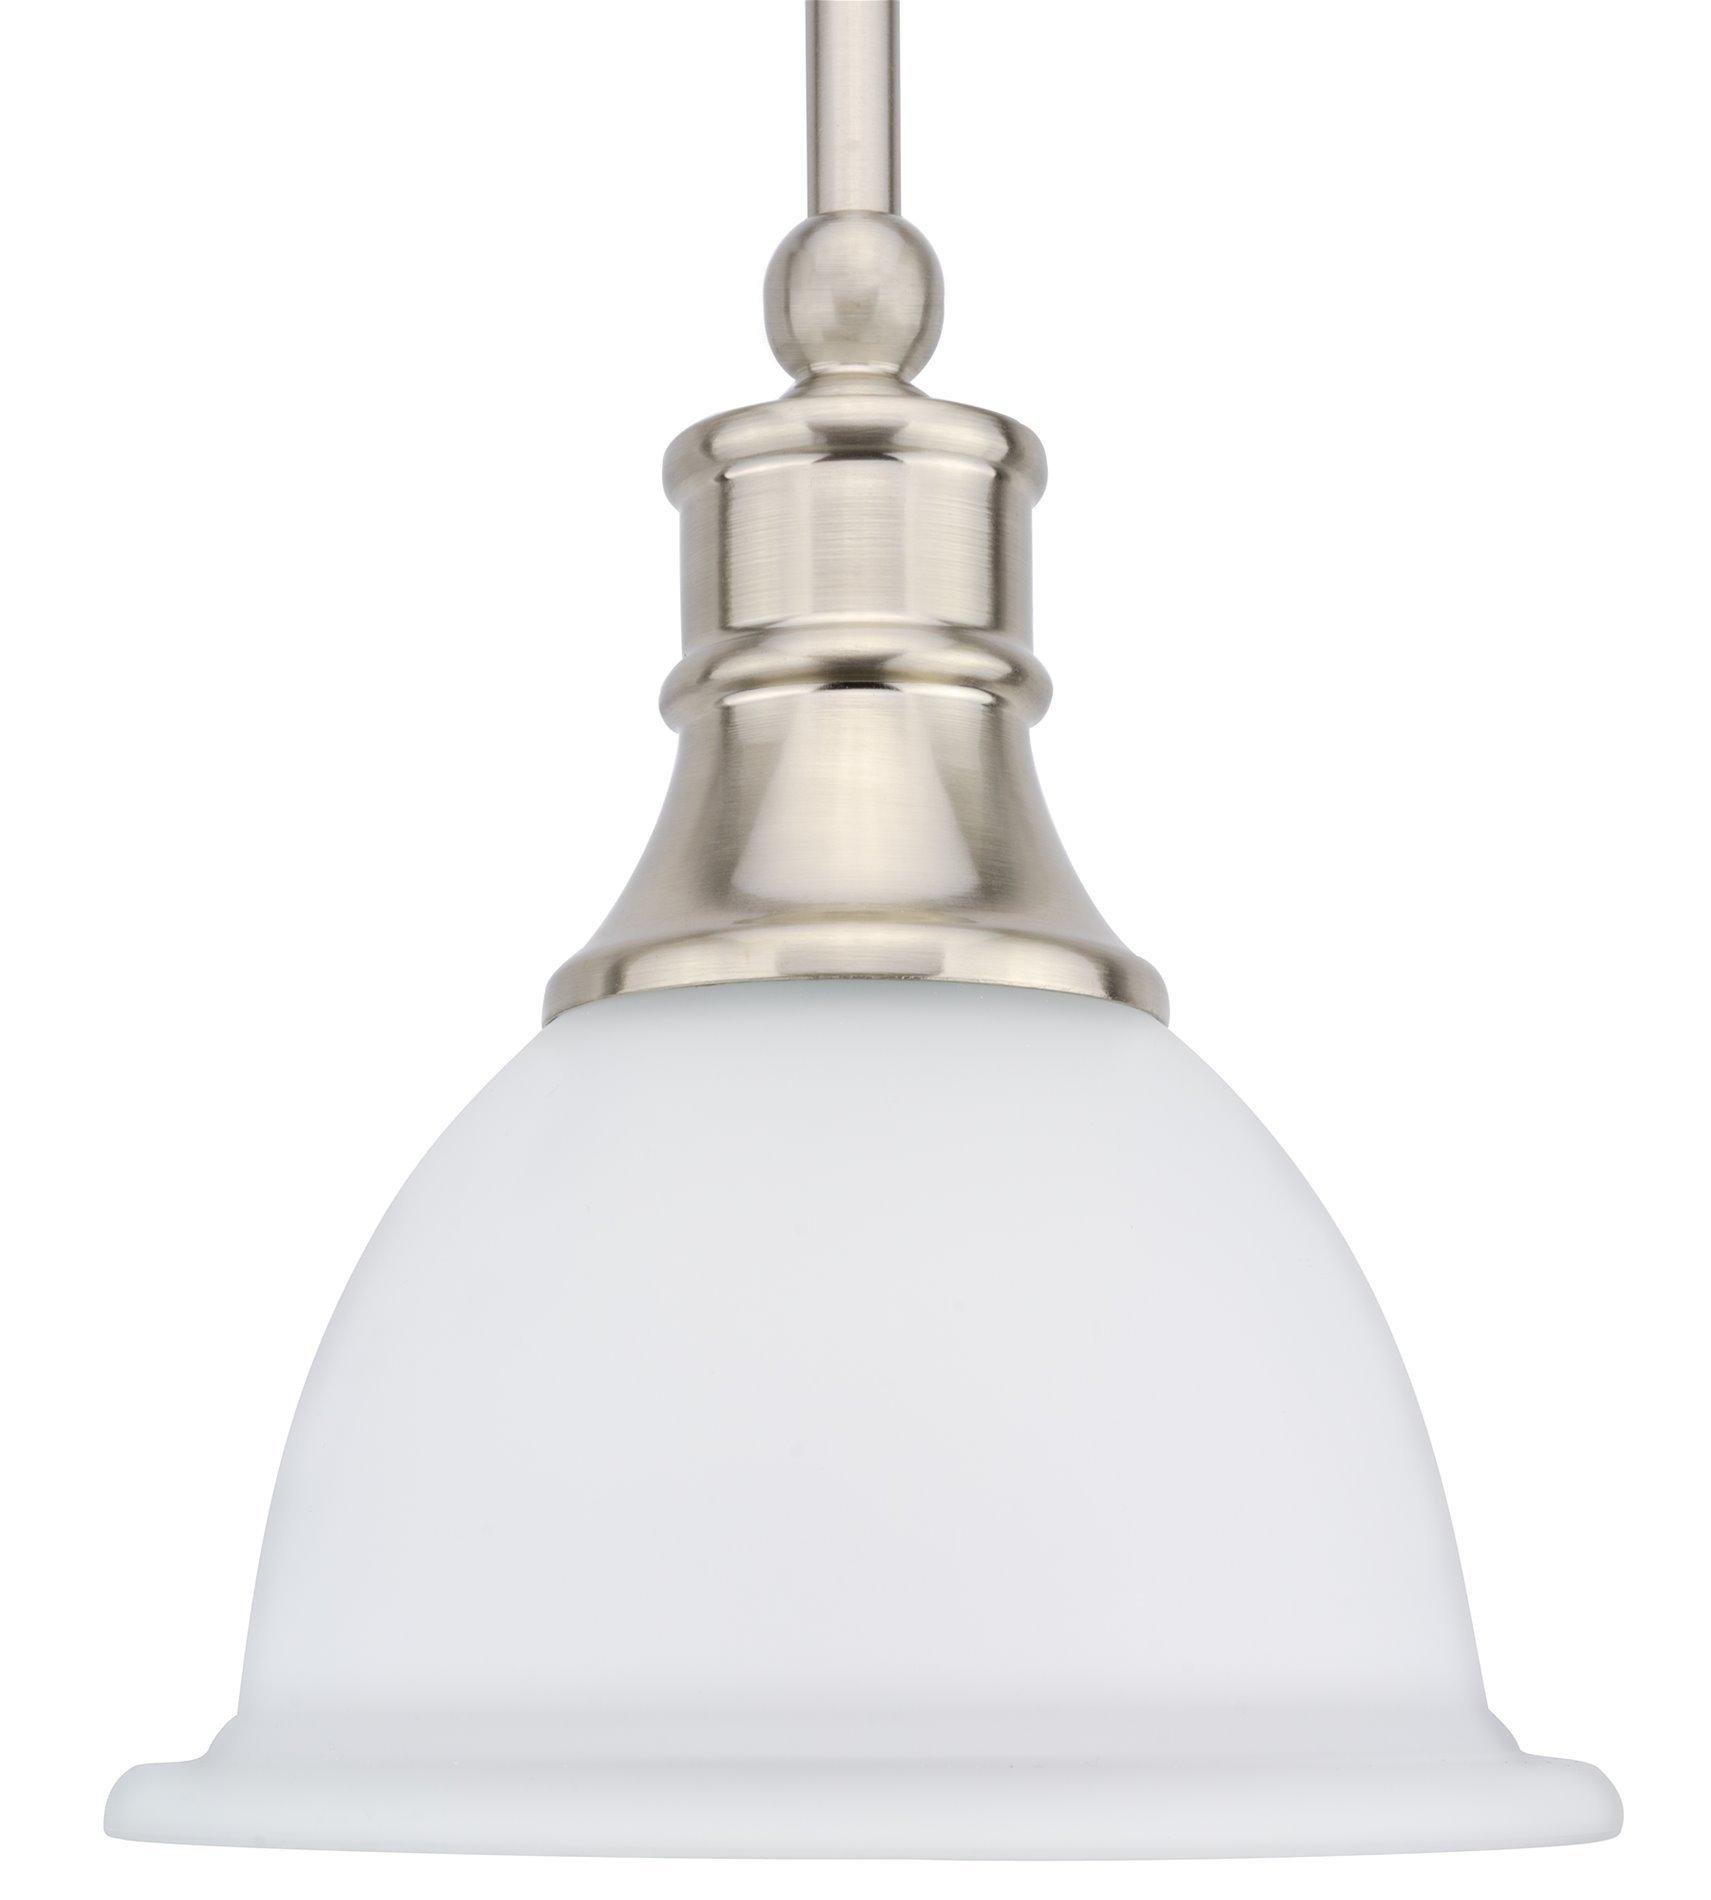 Revel Ellie 8'' Adjustable Mini Pendant Light w/Frosted Glass Shade & Brushed Nickel Finish